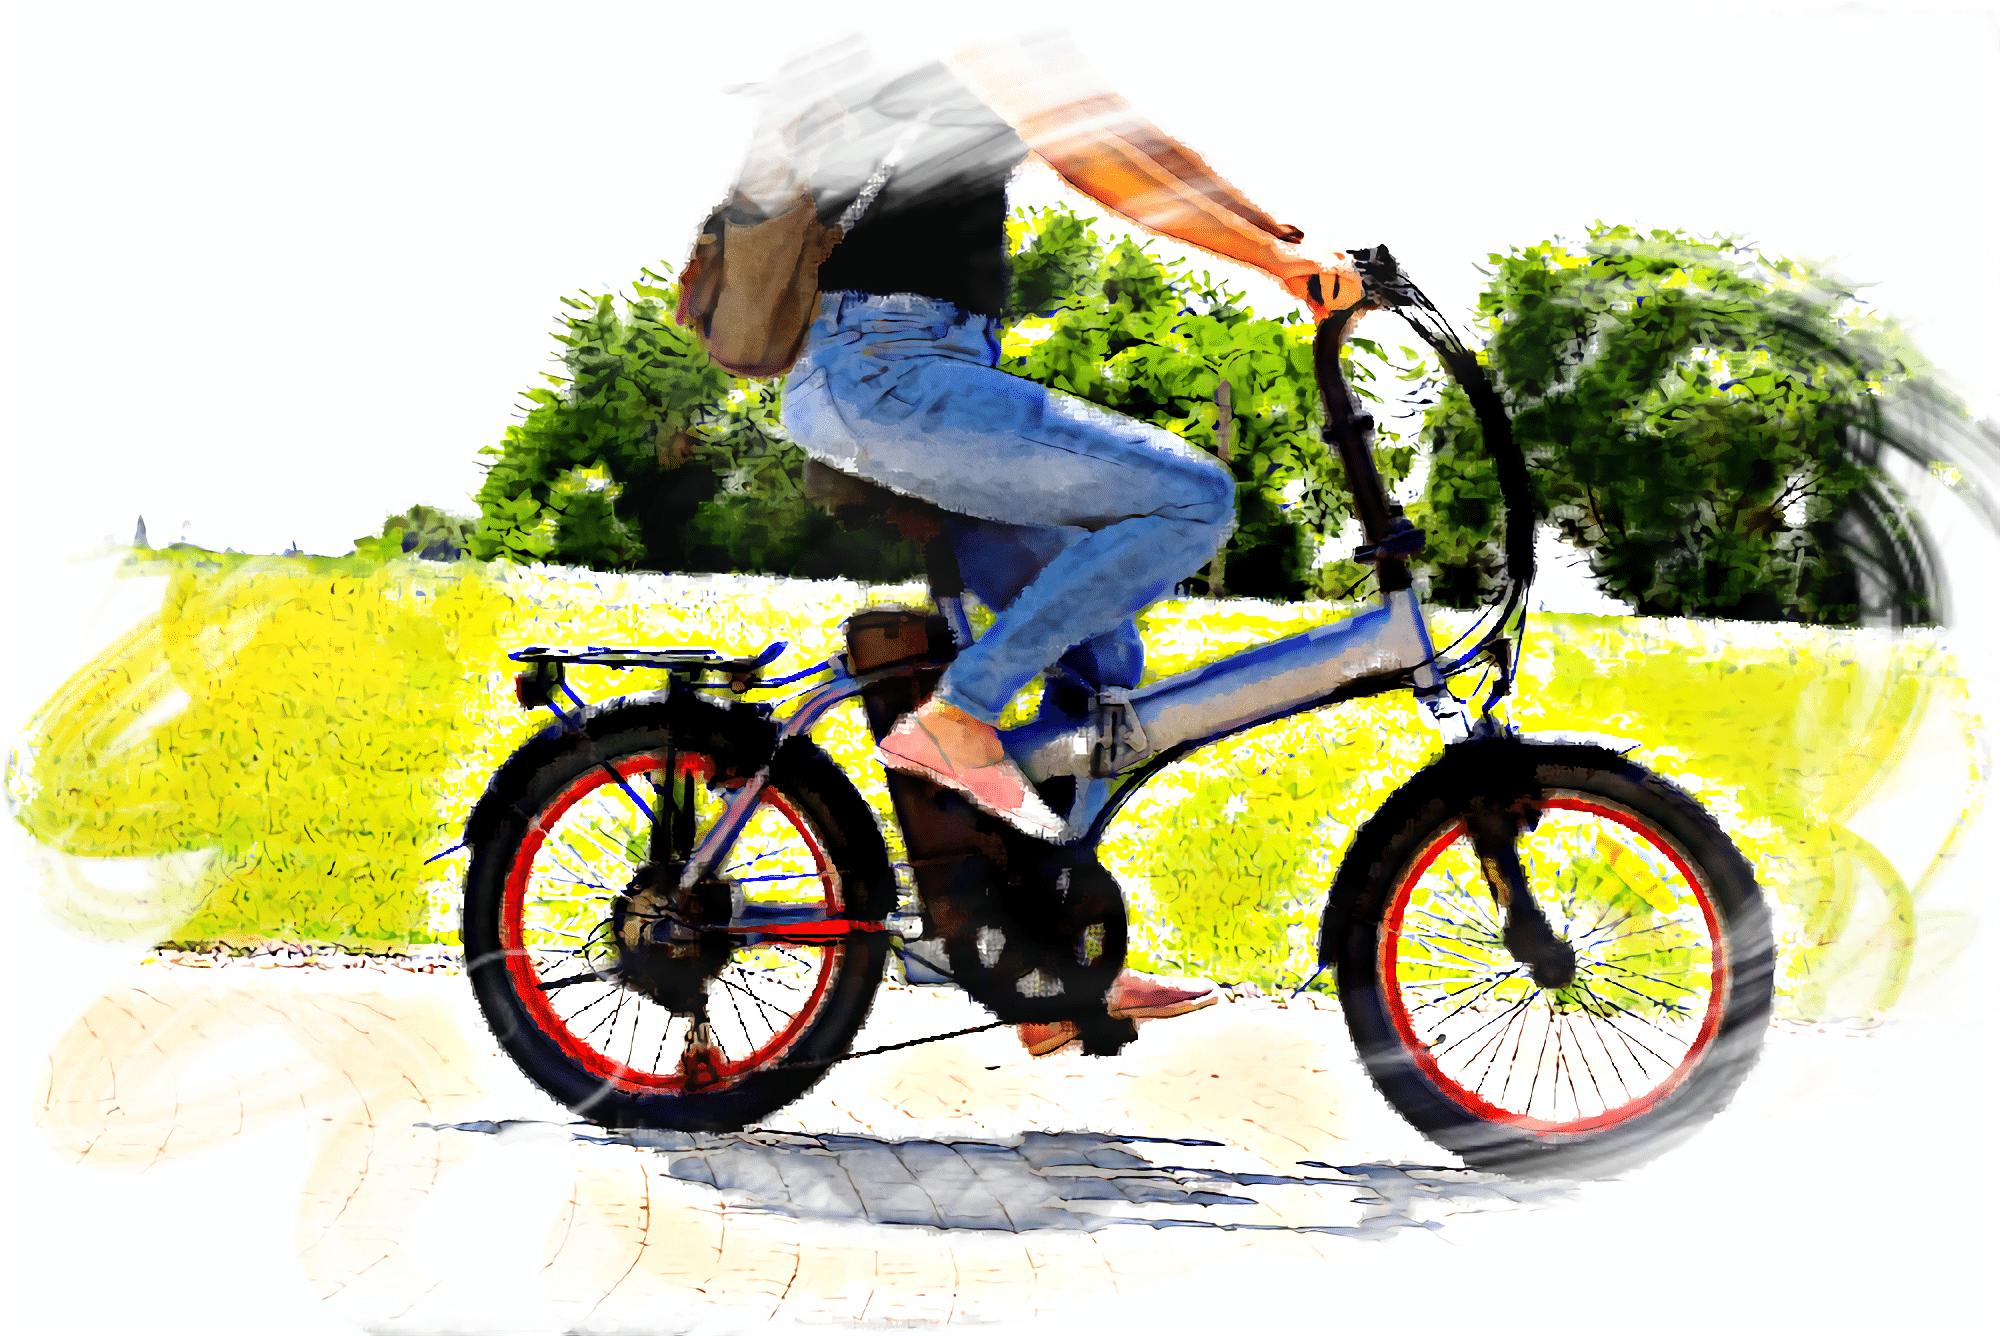 e-Bike(ミニベロ)の購入を考えている方必見!値段・乗り心地・デザイン・安全性についてご紹介。